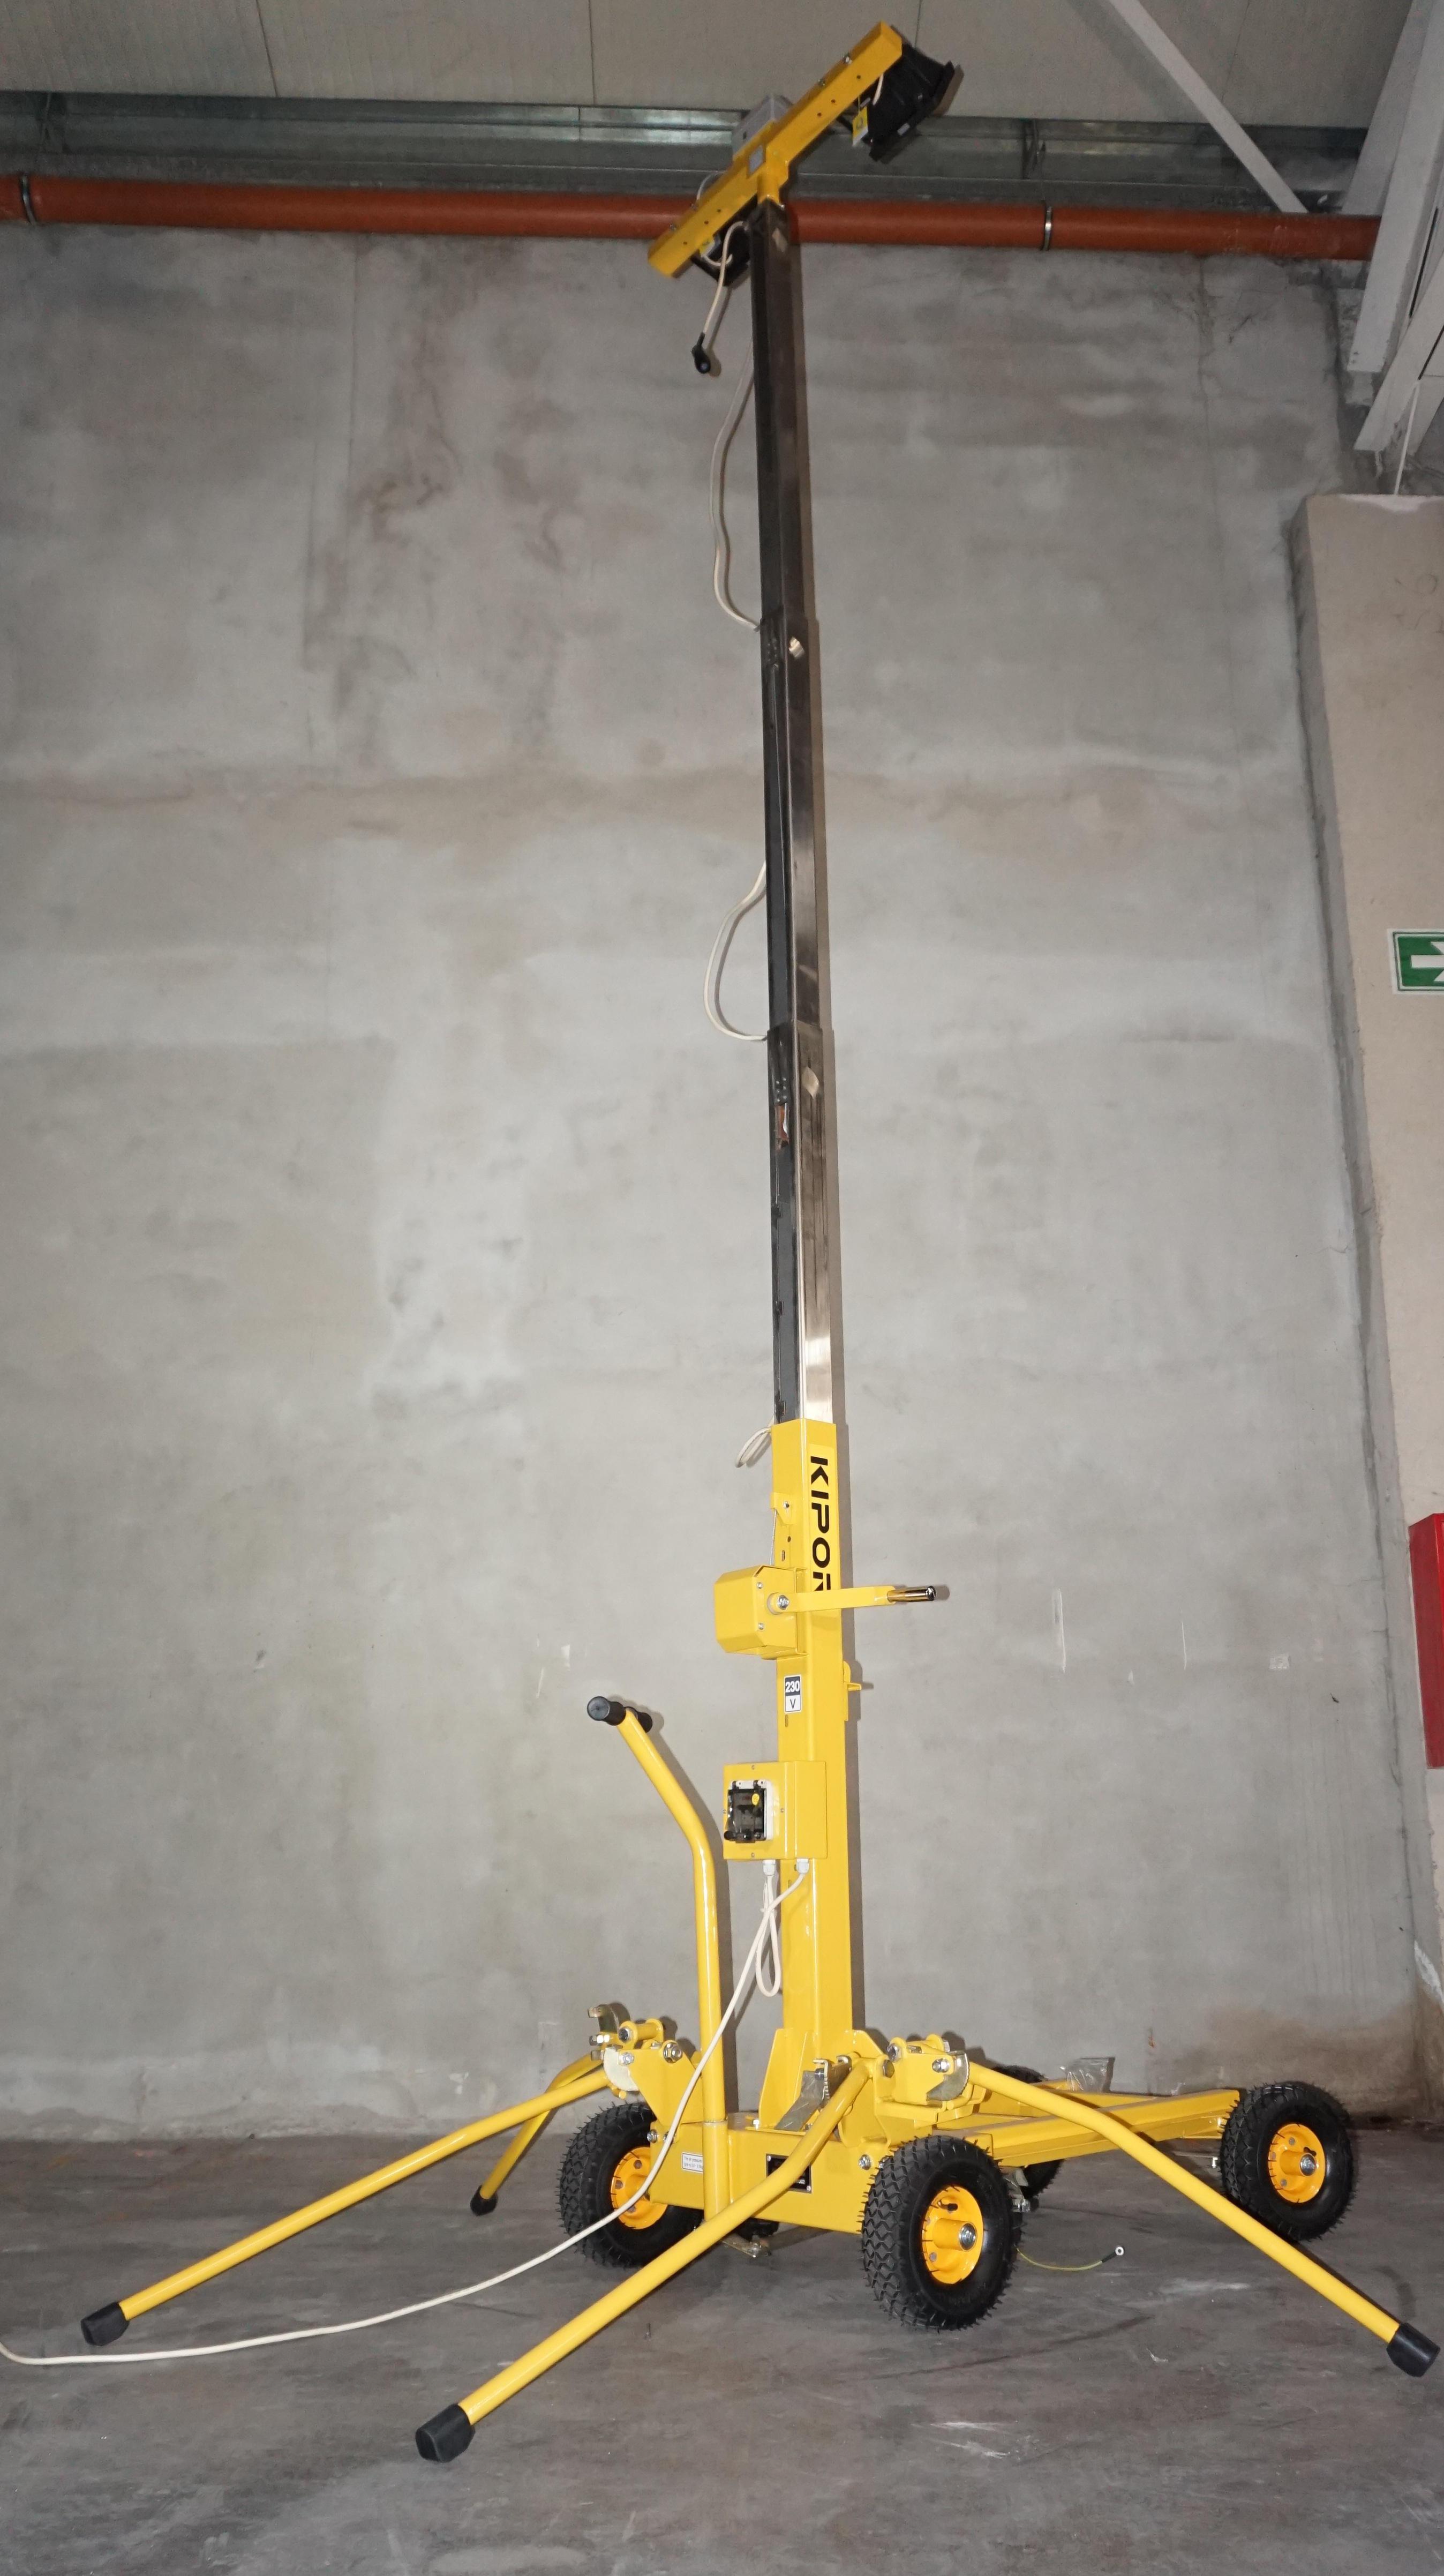 Kipor KLJ400-2 turn de iluminat 2x400W, halogen, telescopic [2]